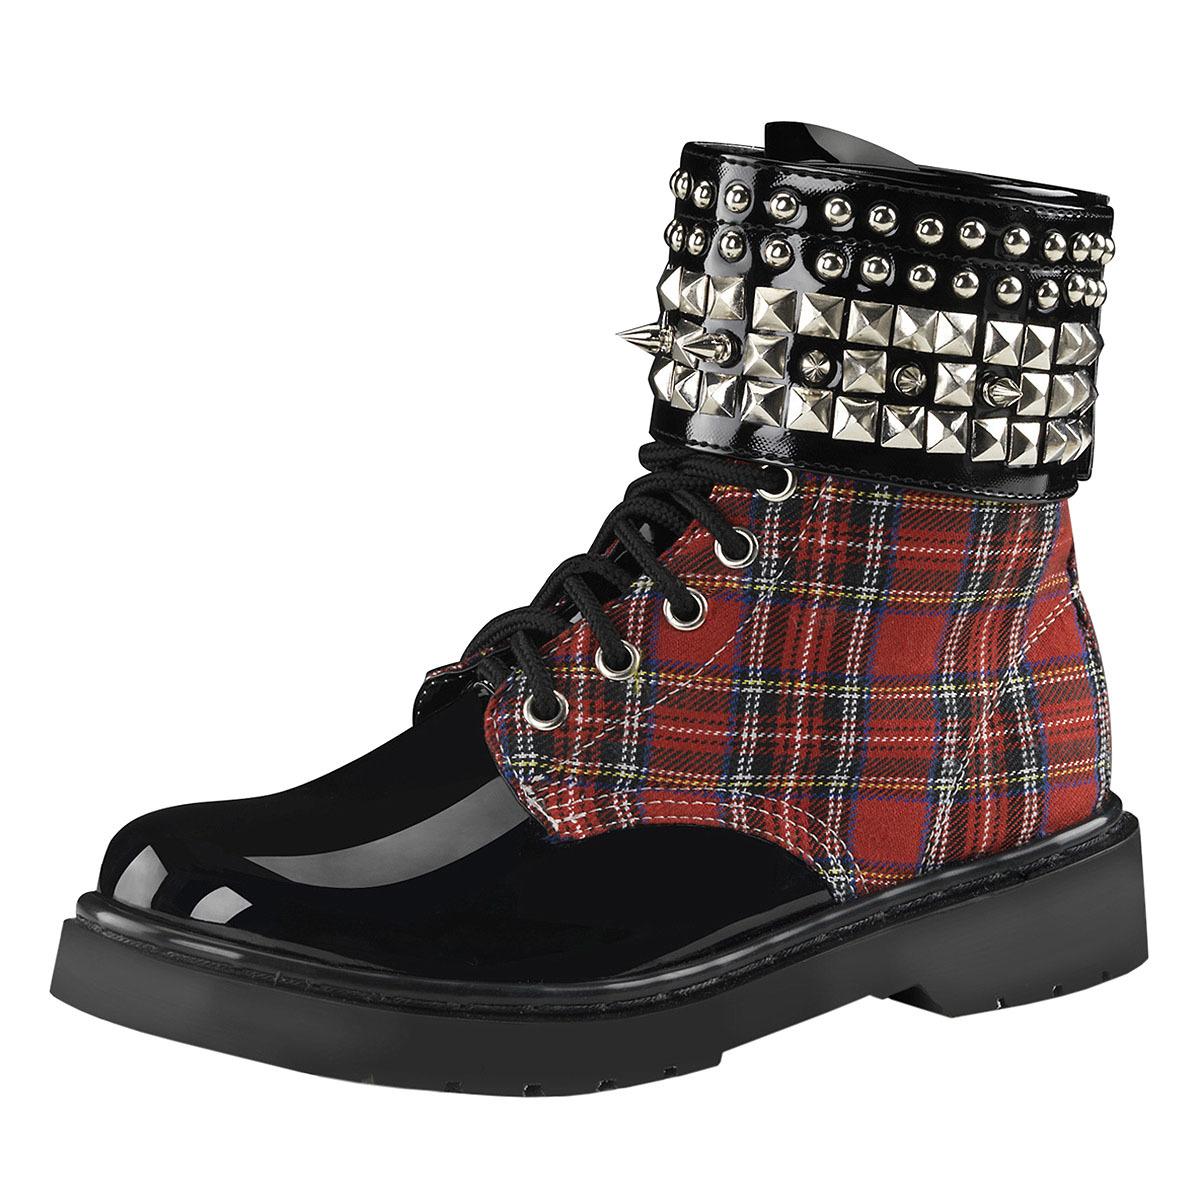 Womens Red Combat Boots Plaid Shoes Studded Cuff Black La...